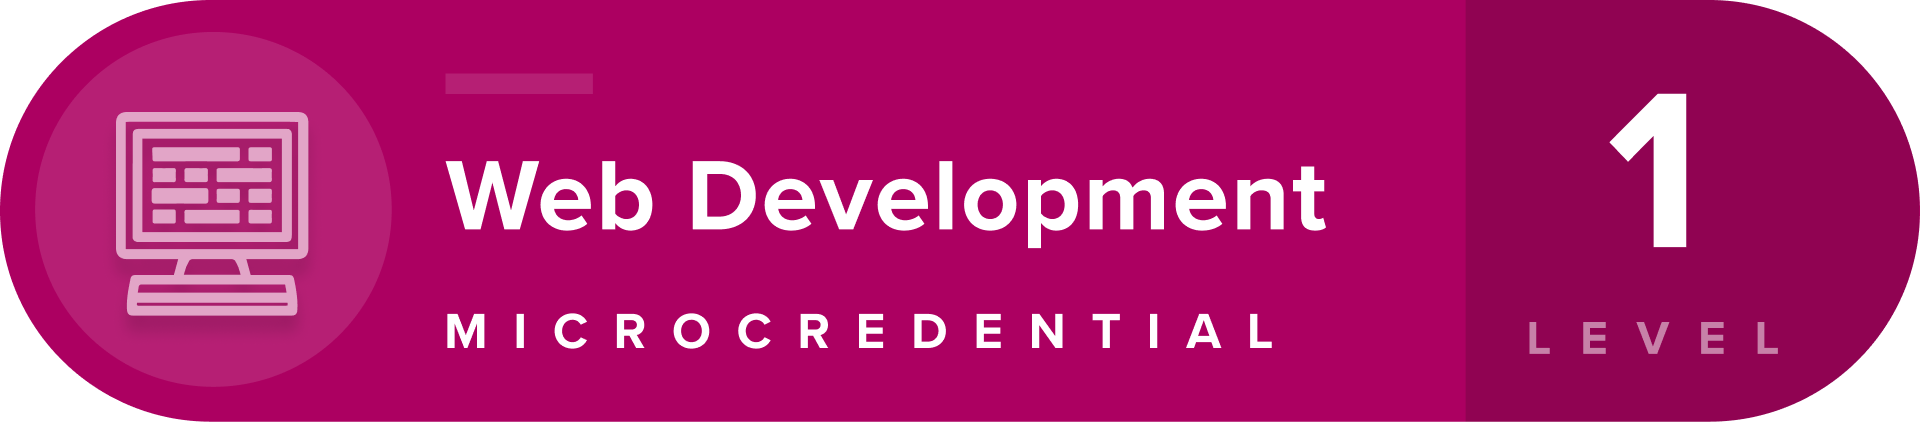 Web Development microcredentials level 1 badge